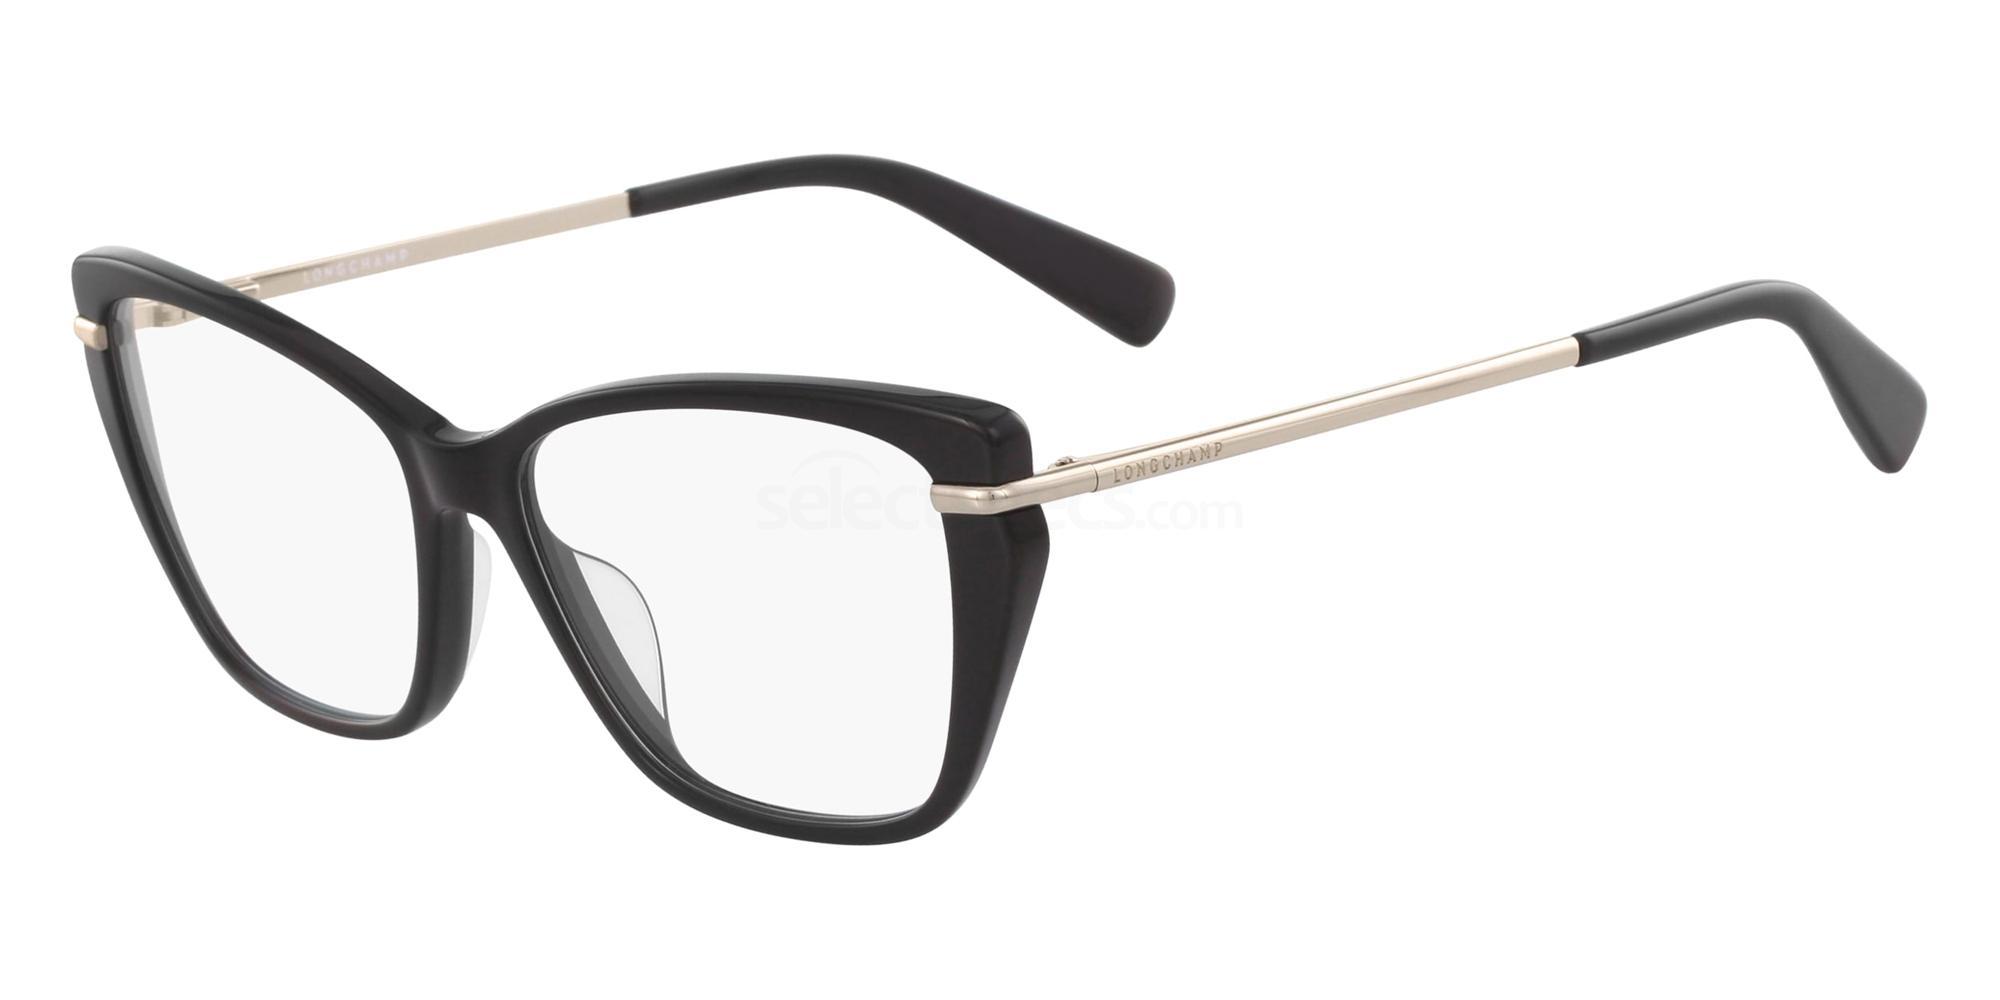 001 LO2630 Glasses, LONGCHAMP